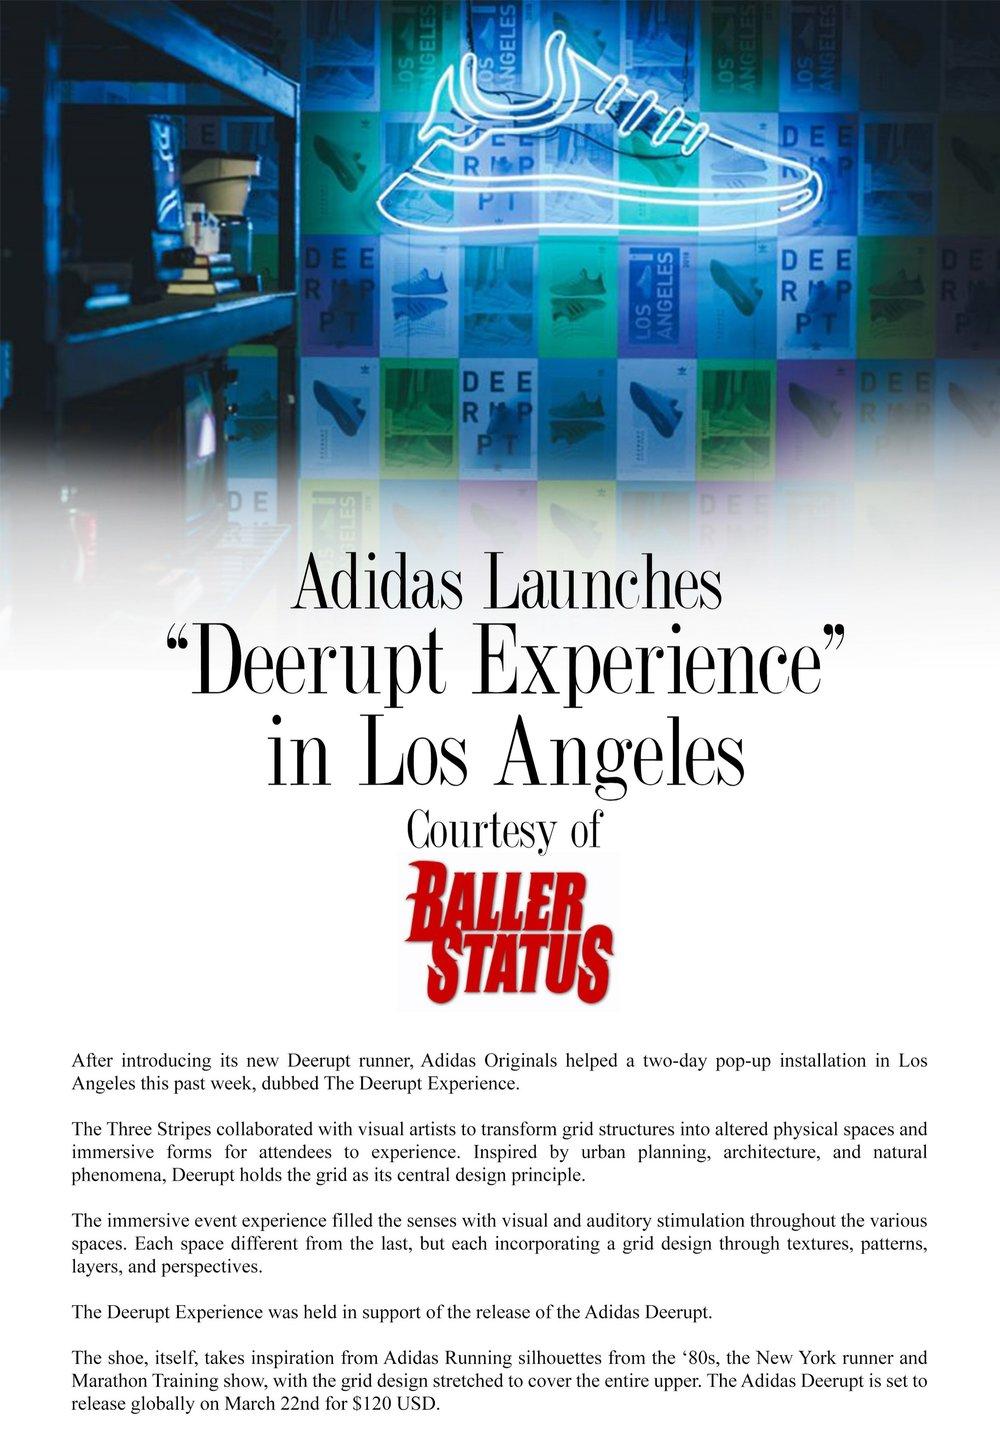 Adidas_LA_header.jpg